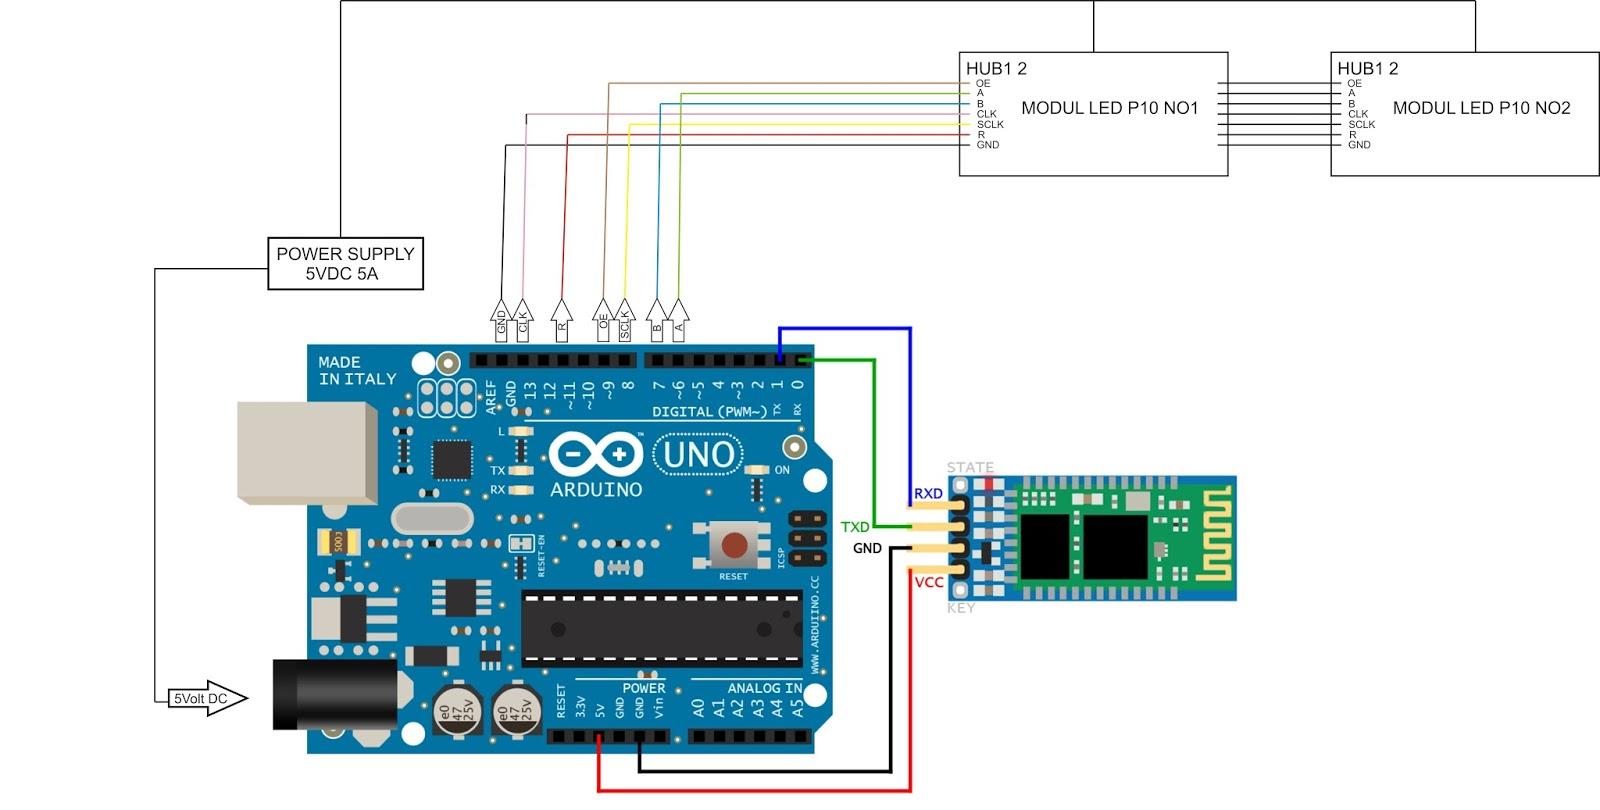 Imam tech innovation arduino uno running text bluetooth